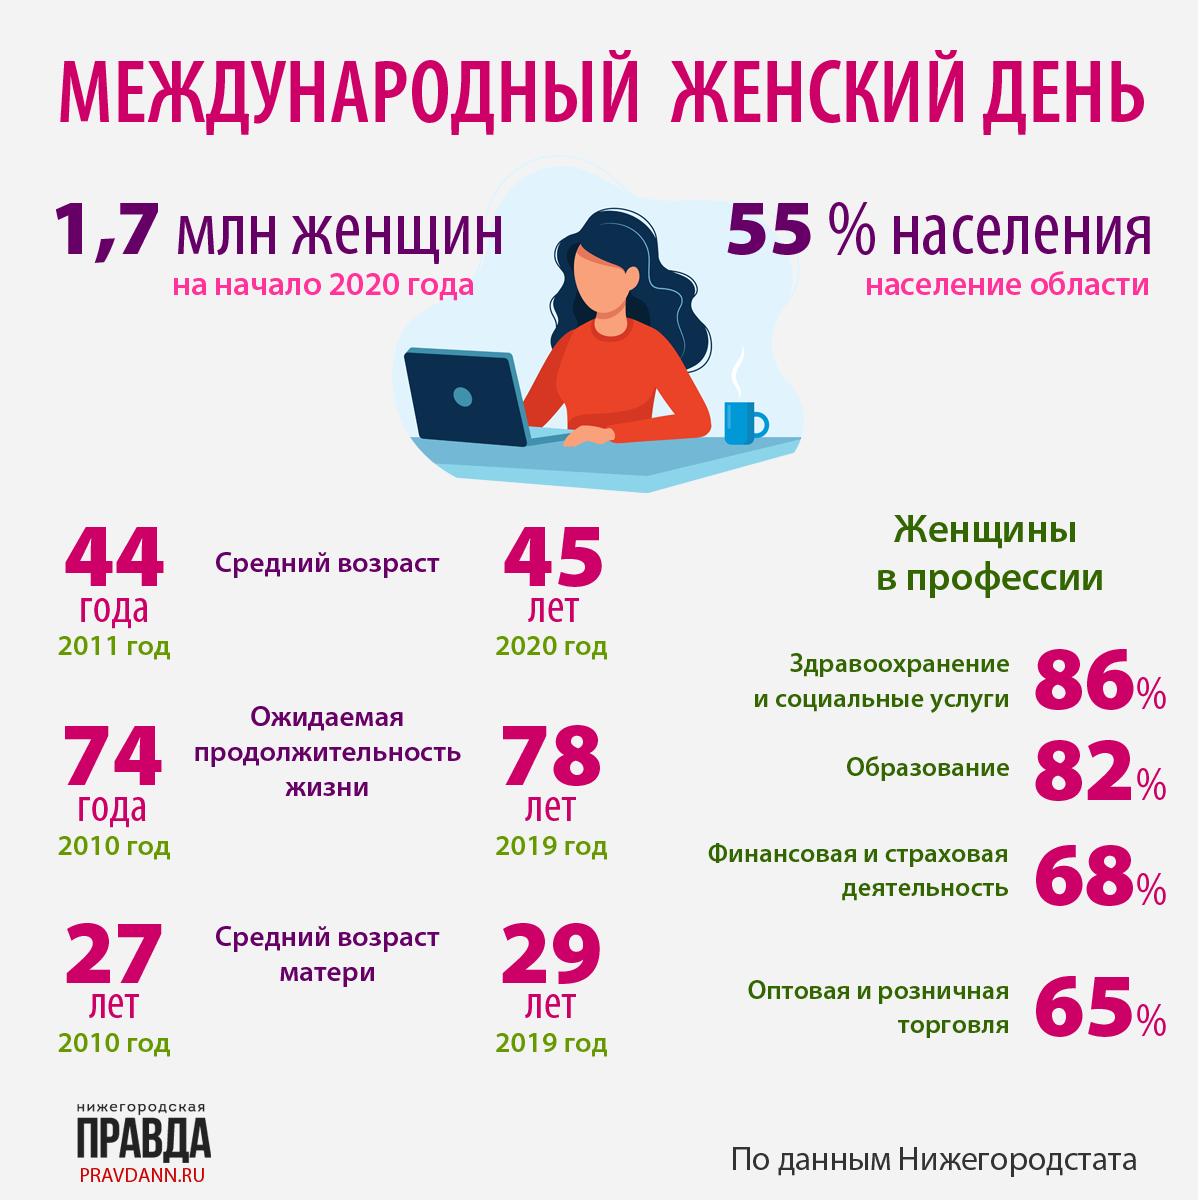 инфографика про нижегородок